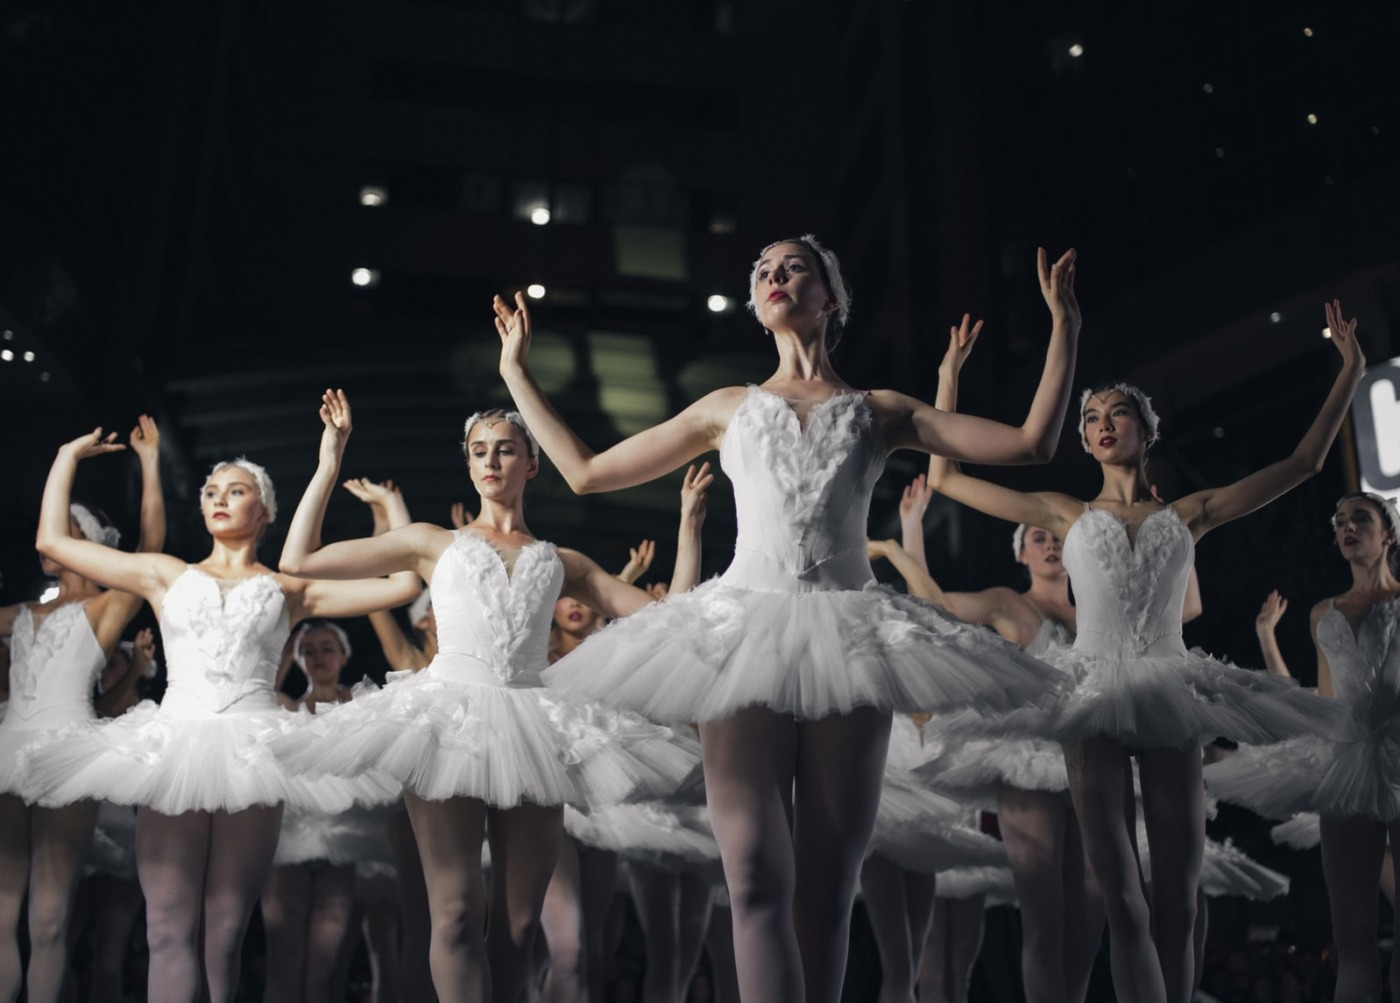 class divide ballet elitism